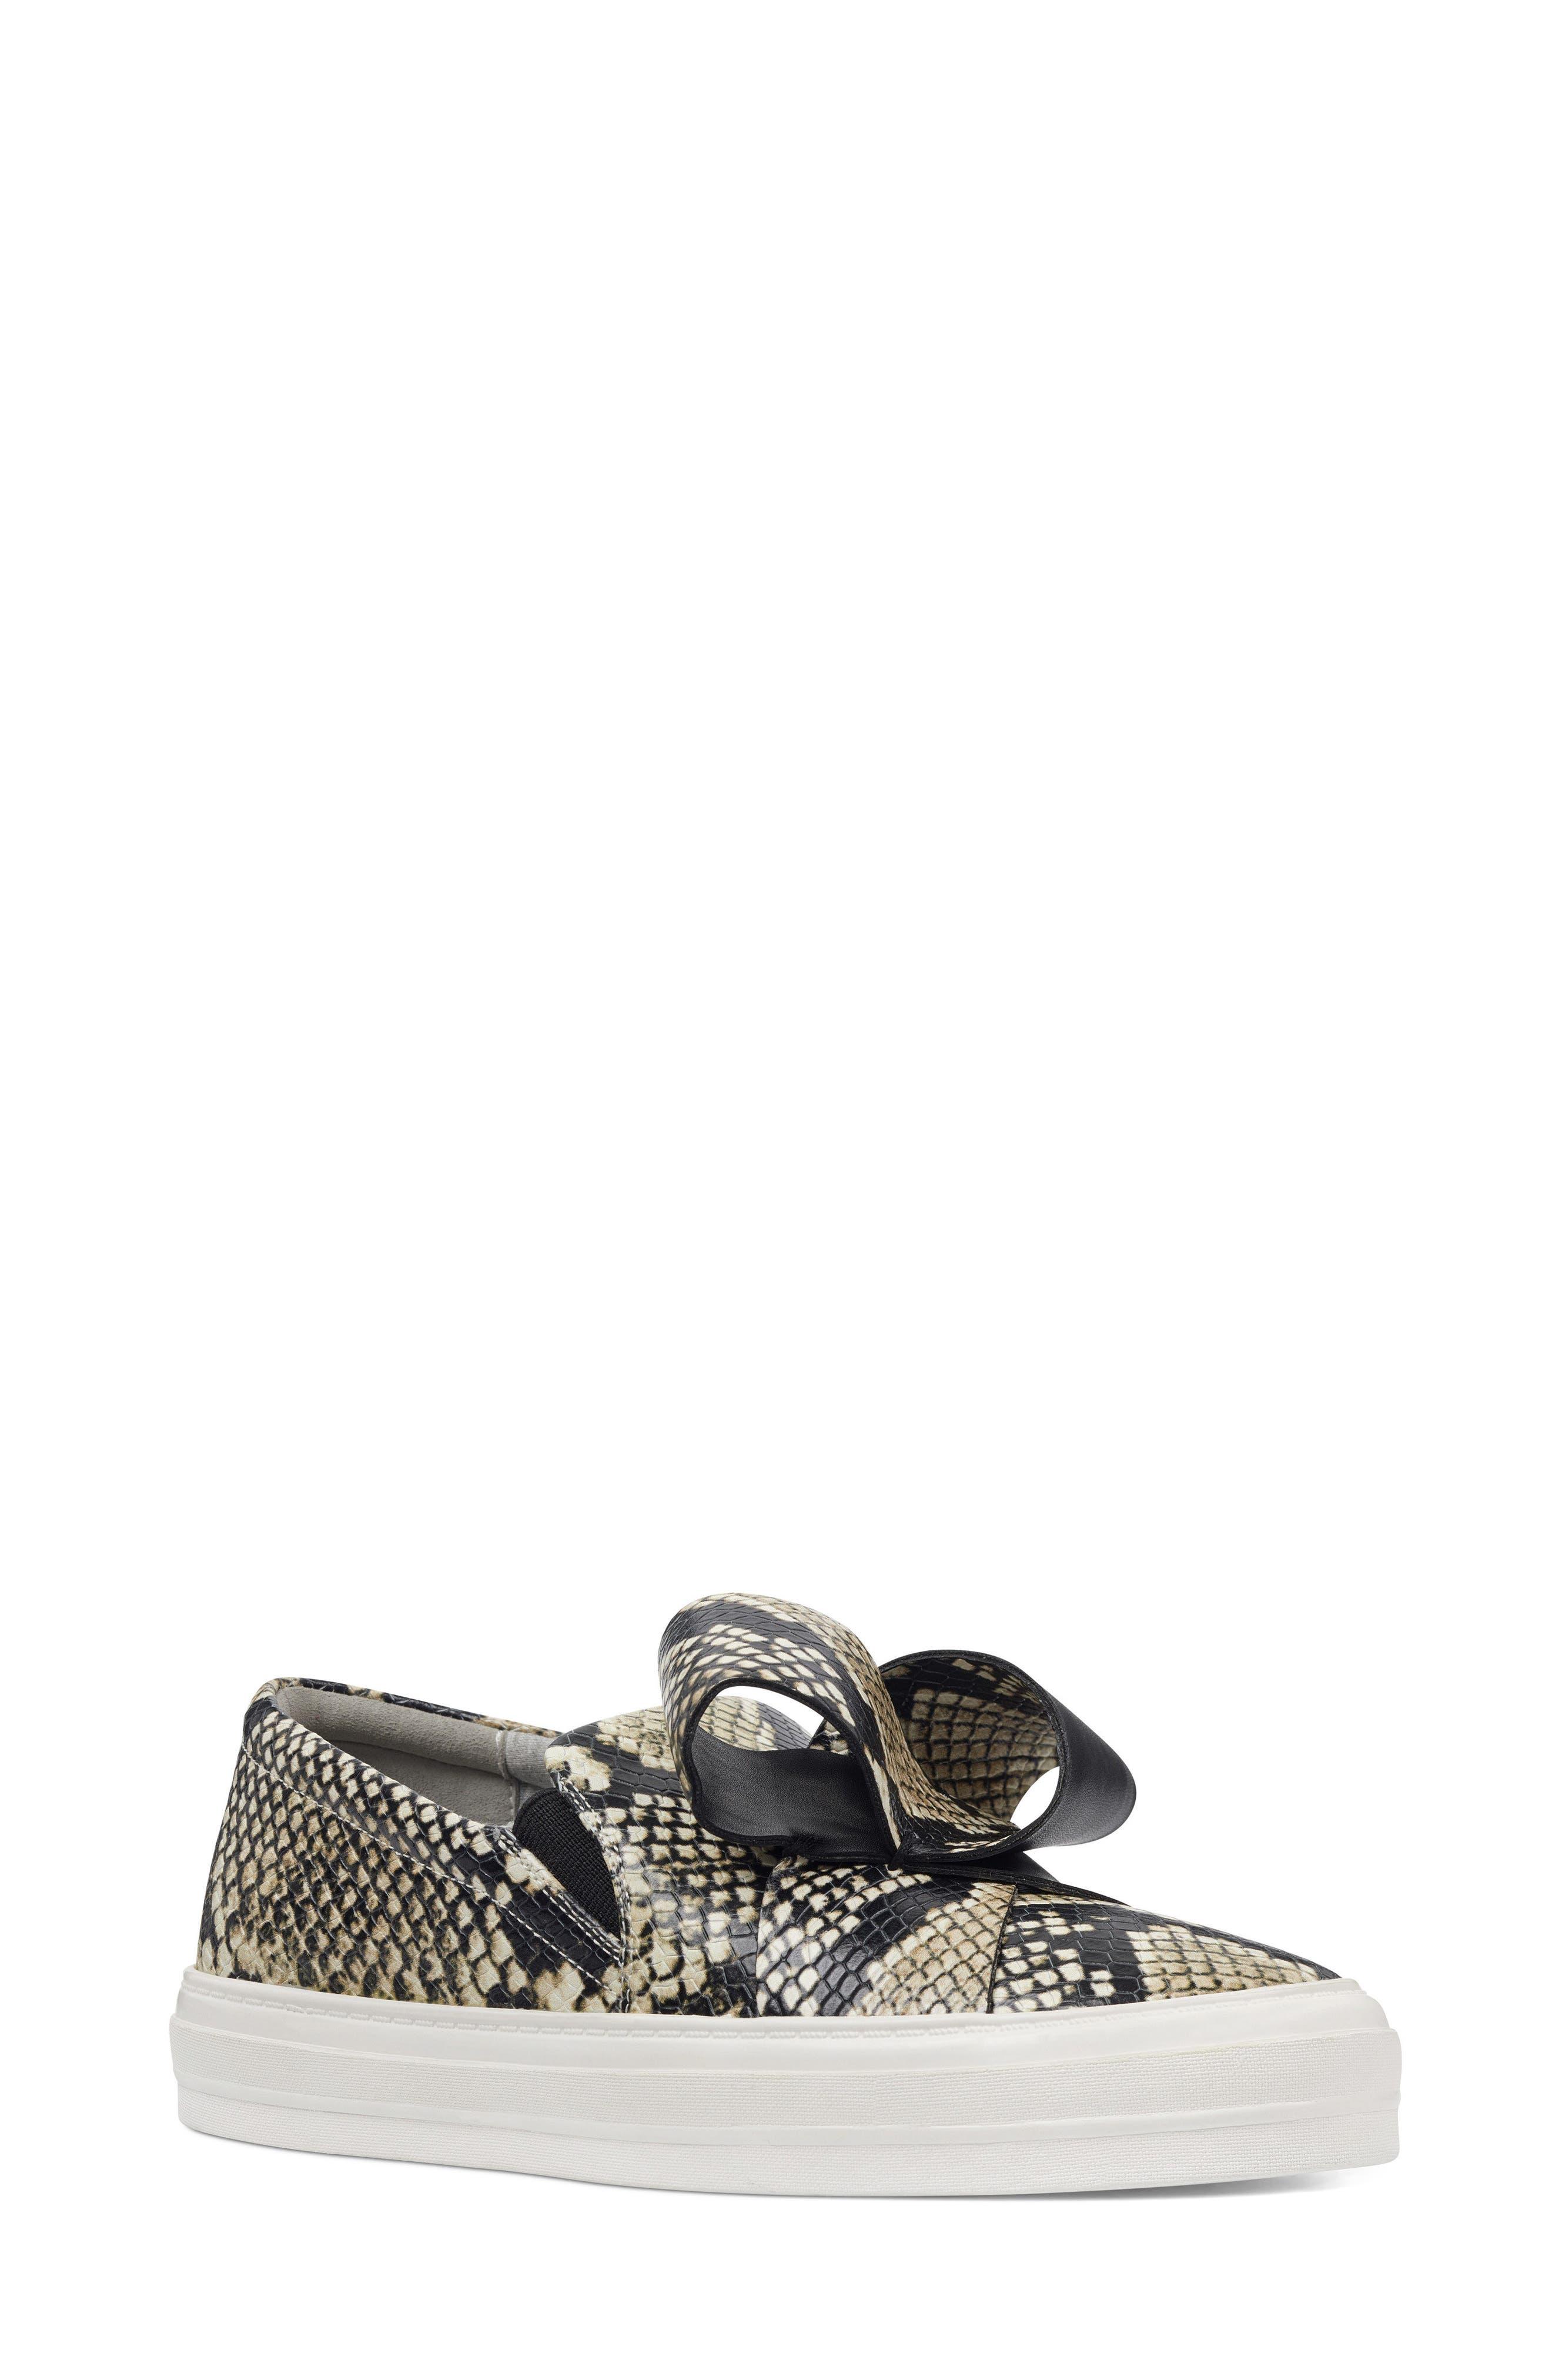 Odienella Slip-On Sneaker,                             Main thumbnail 1, color,                             Off White Multi Leather